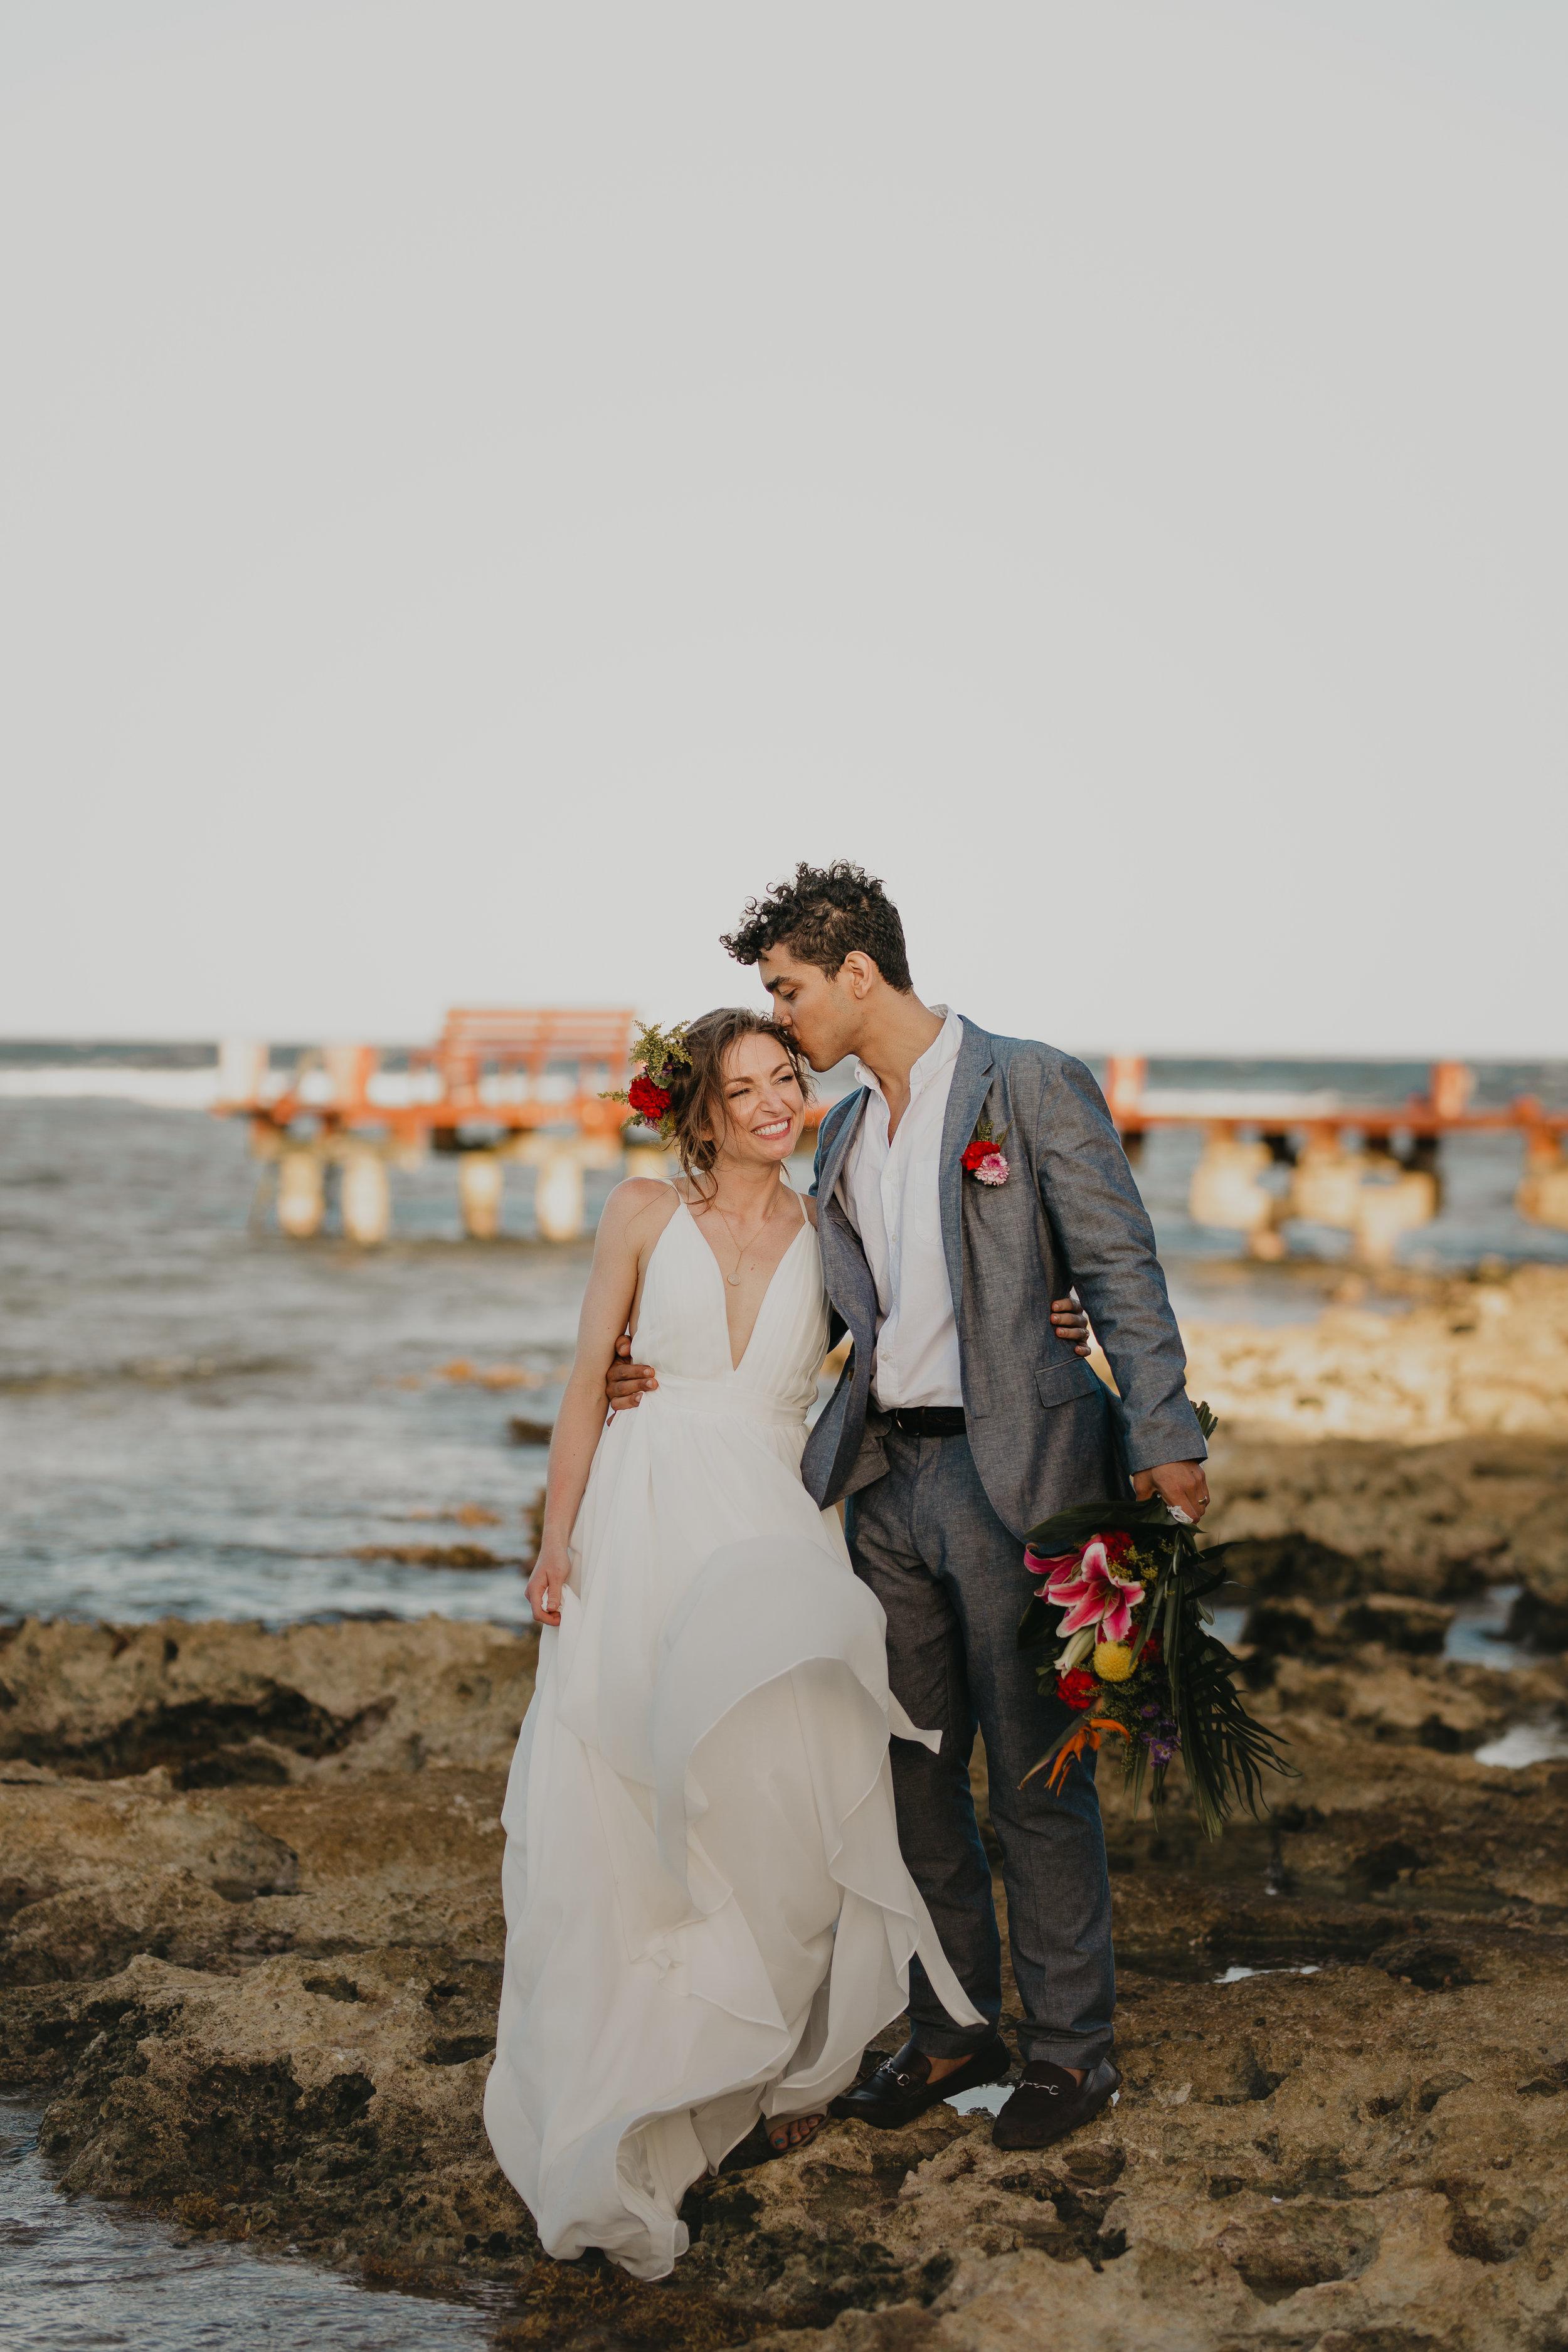 Nicole-Daacke-Photography-beachfront-akumal-destionation-wedding-tulum-mexico-elopement-photographer-destination-wedding-inspiration-sunset-champagne-pop-boho-bride-ocean-tropical-bohemian-tulum-wedding-photos-180.jpg